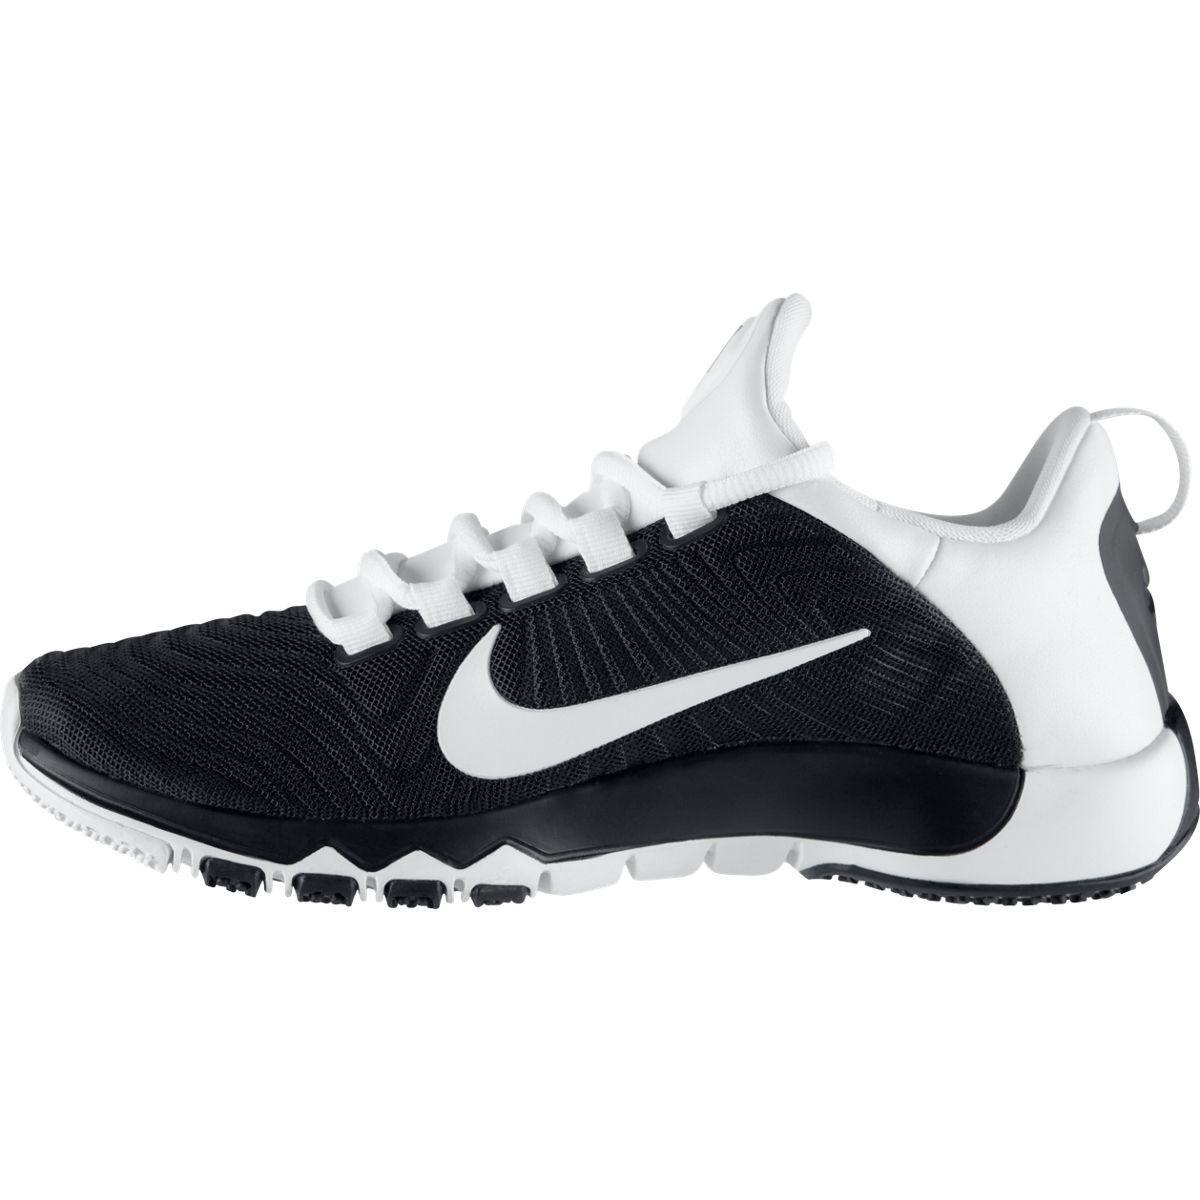 on sale 607e5 735ba ... usa nike mens free trainer 5.0 training shoes black white 27e2b 1428d